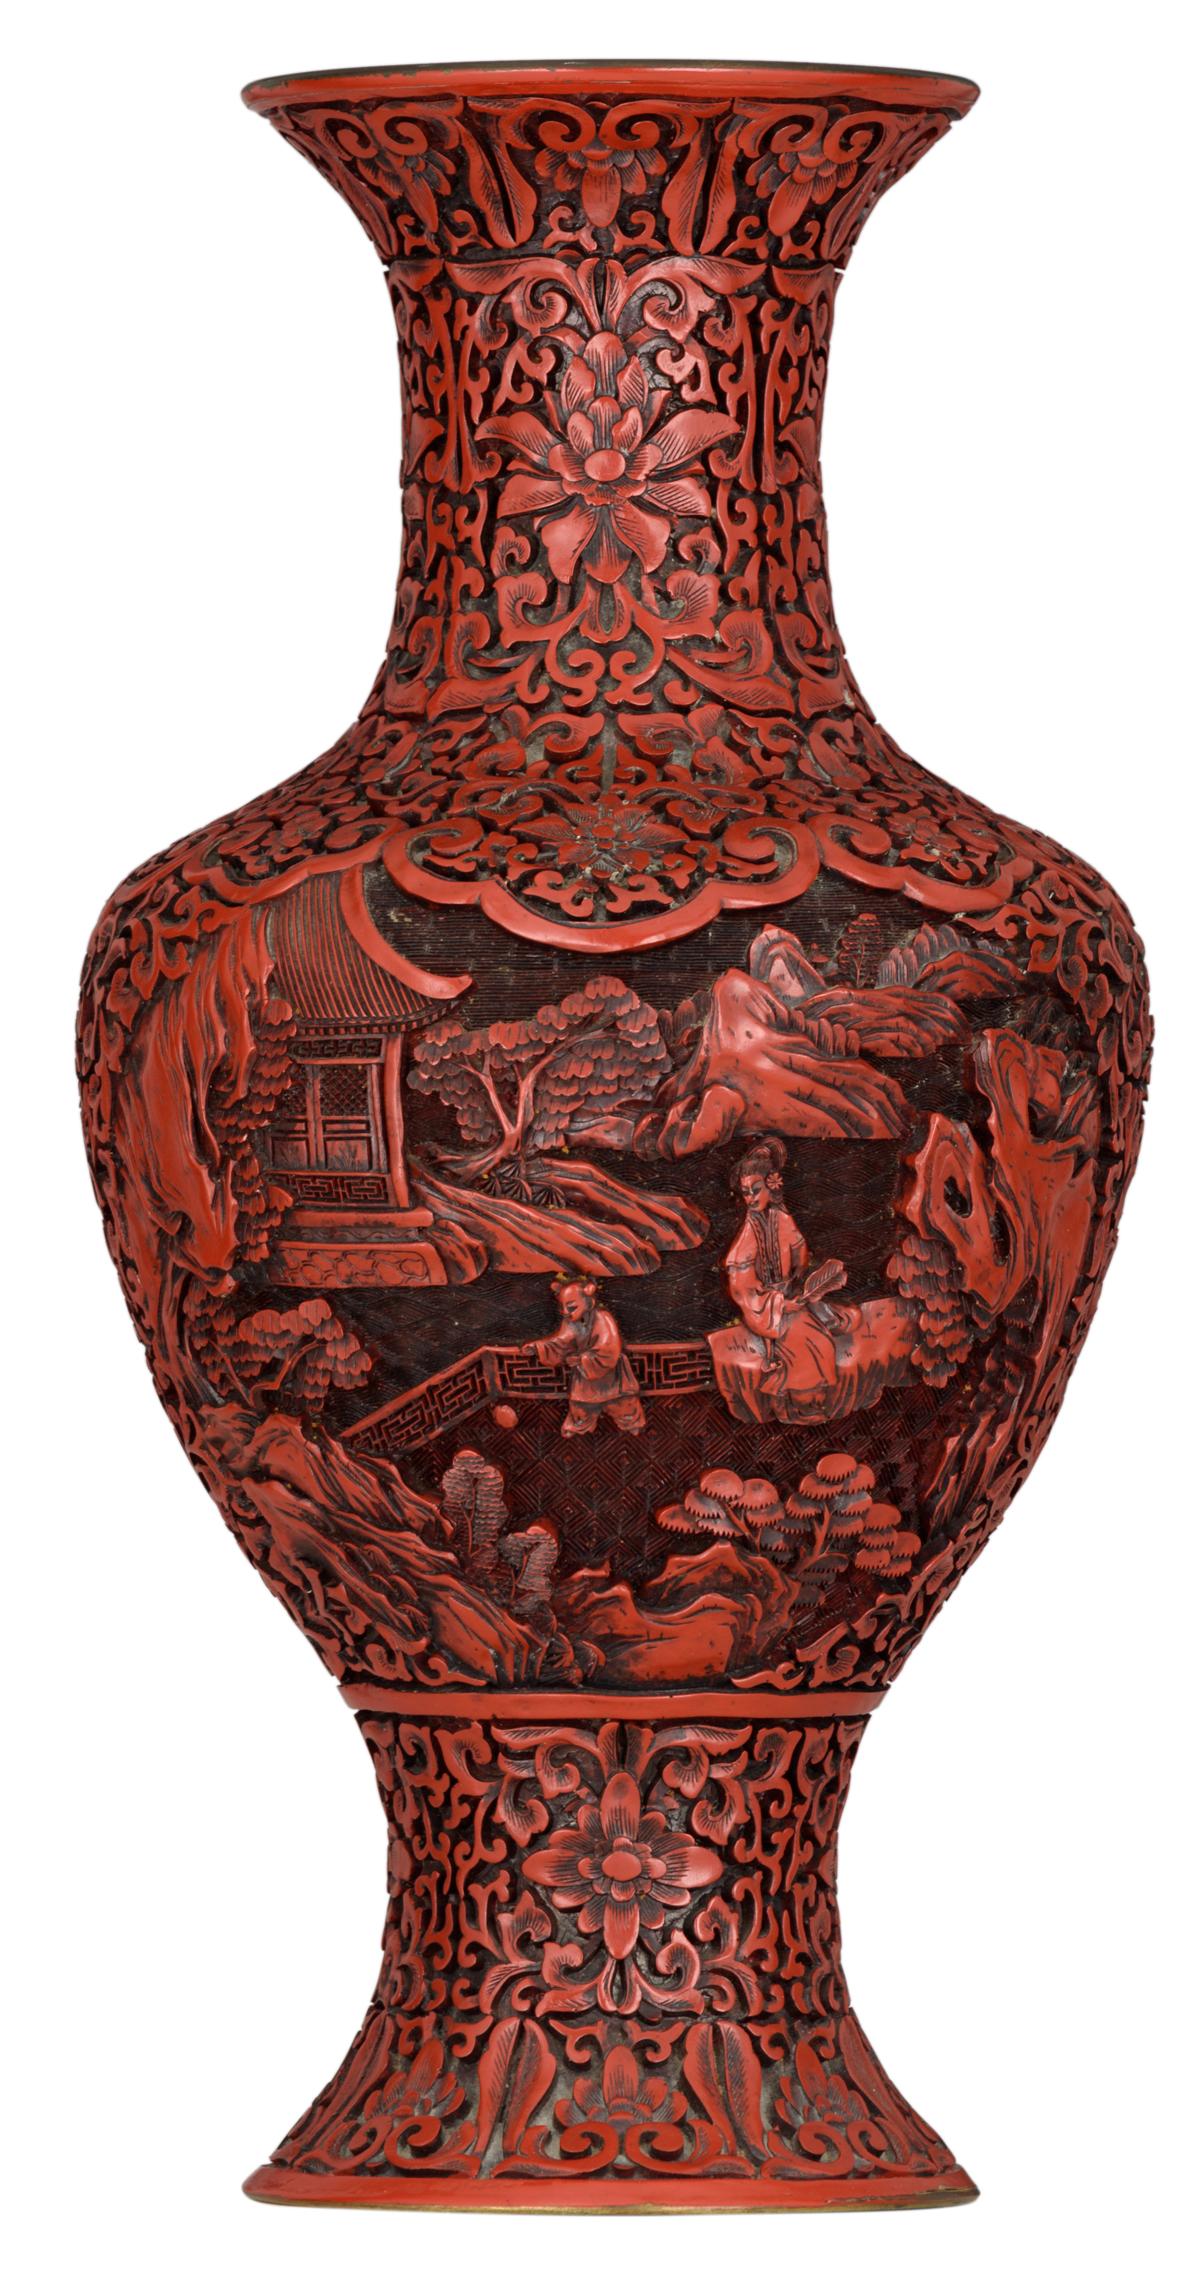 Lot 17 - A Peking cinnabar lacquer baluster vase, H 38,5 cm